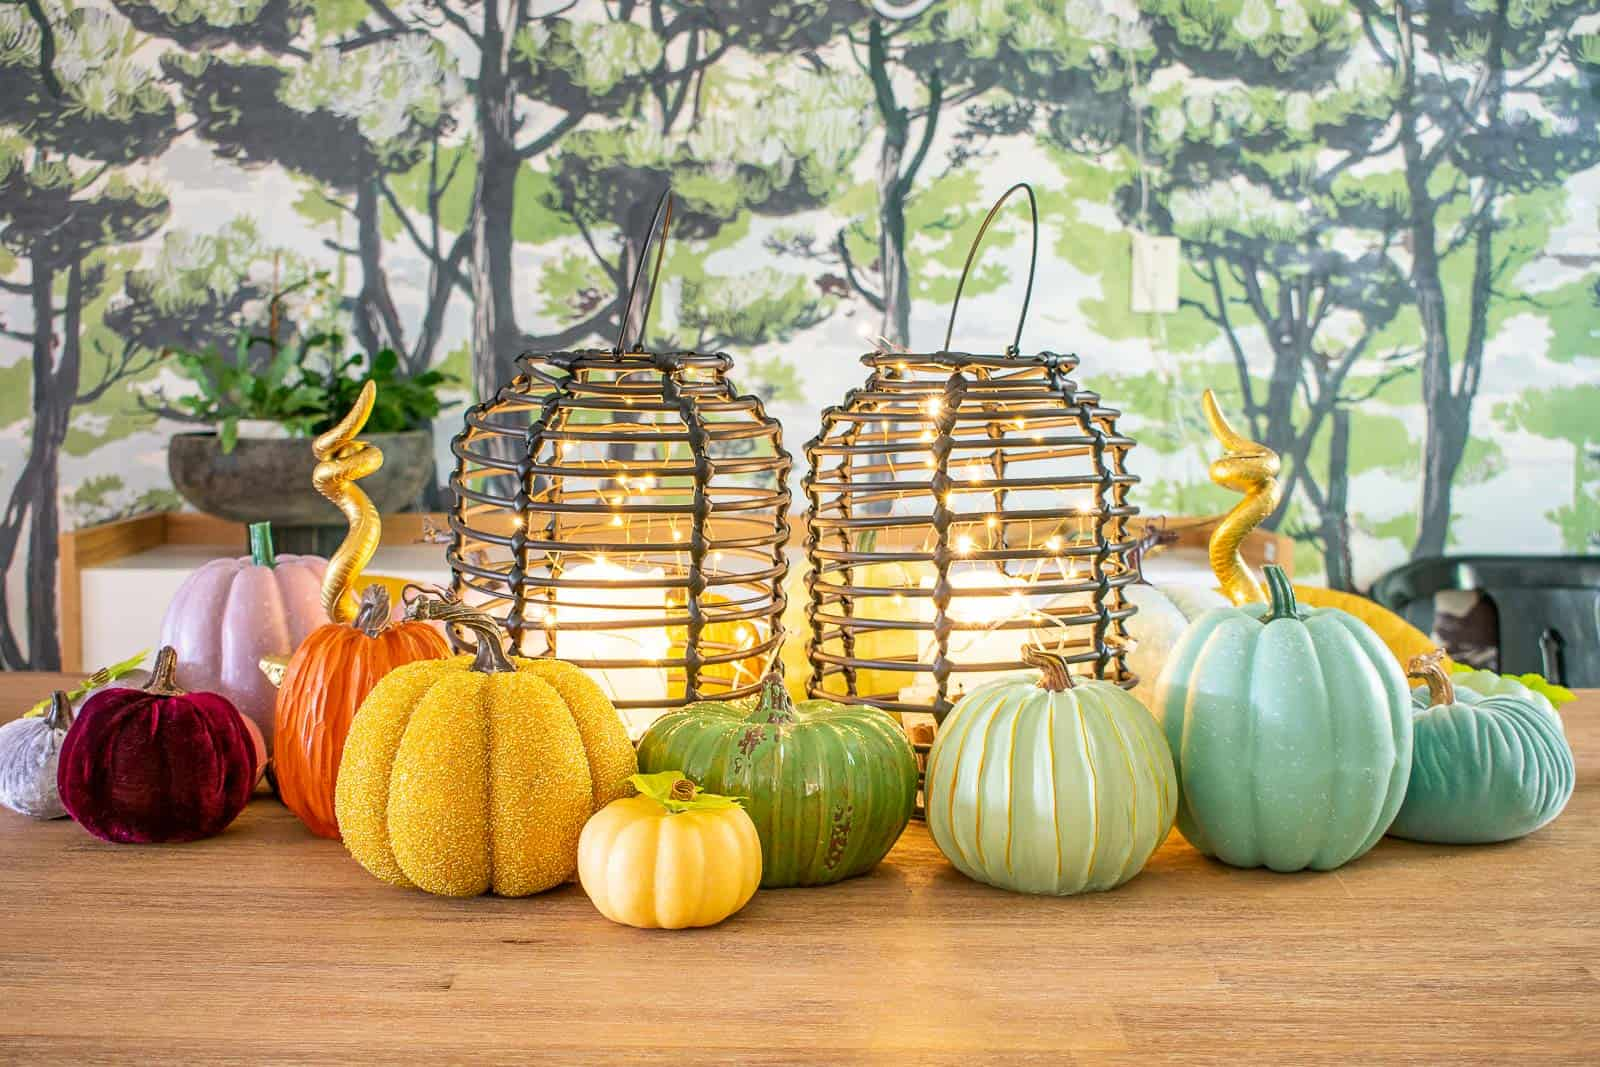 colorful fall pumpkins